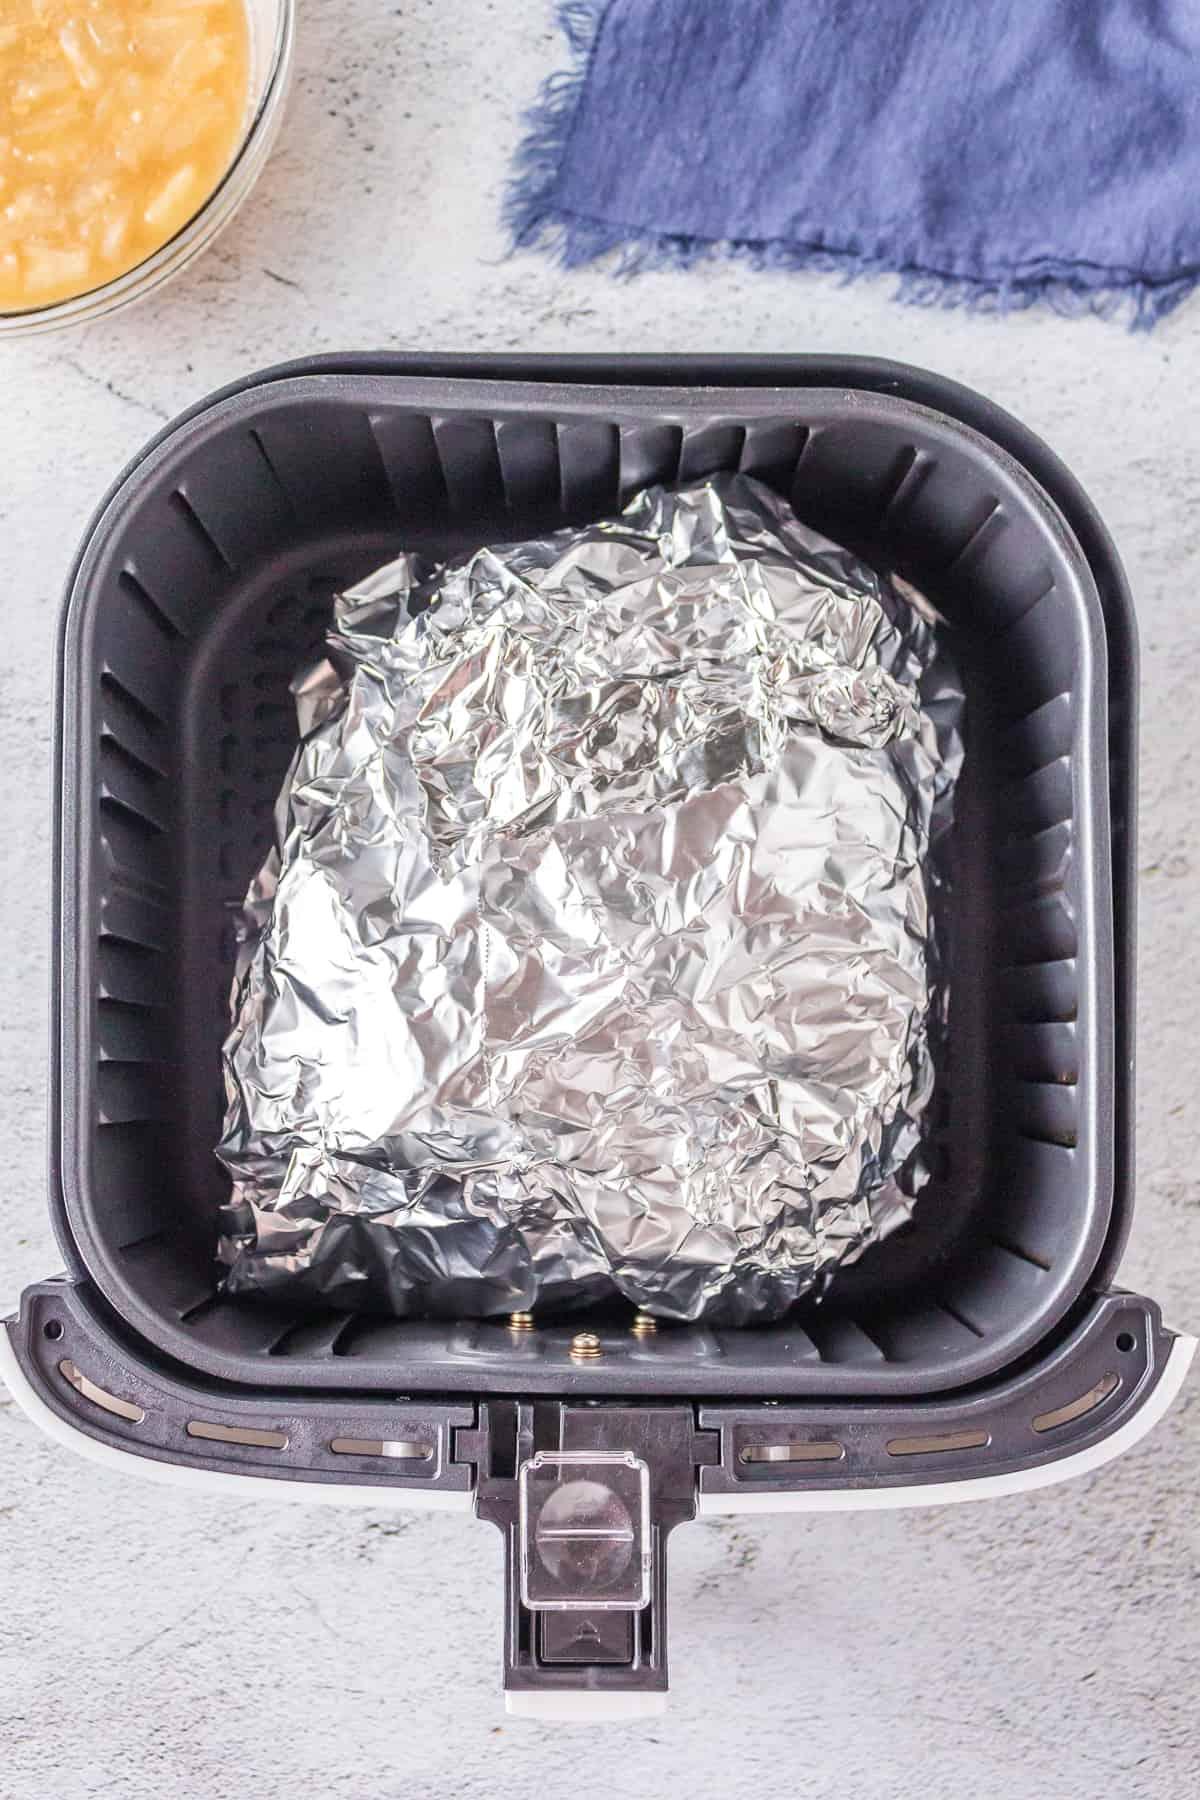 Foil-wrapped ham in air fryer basket